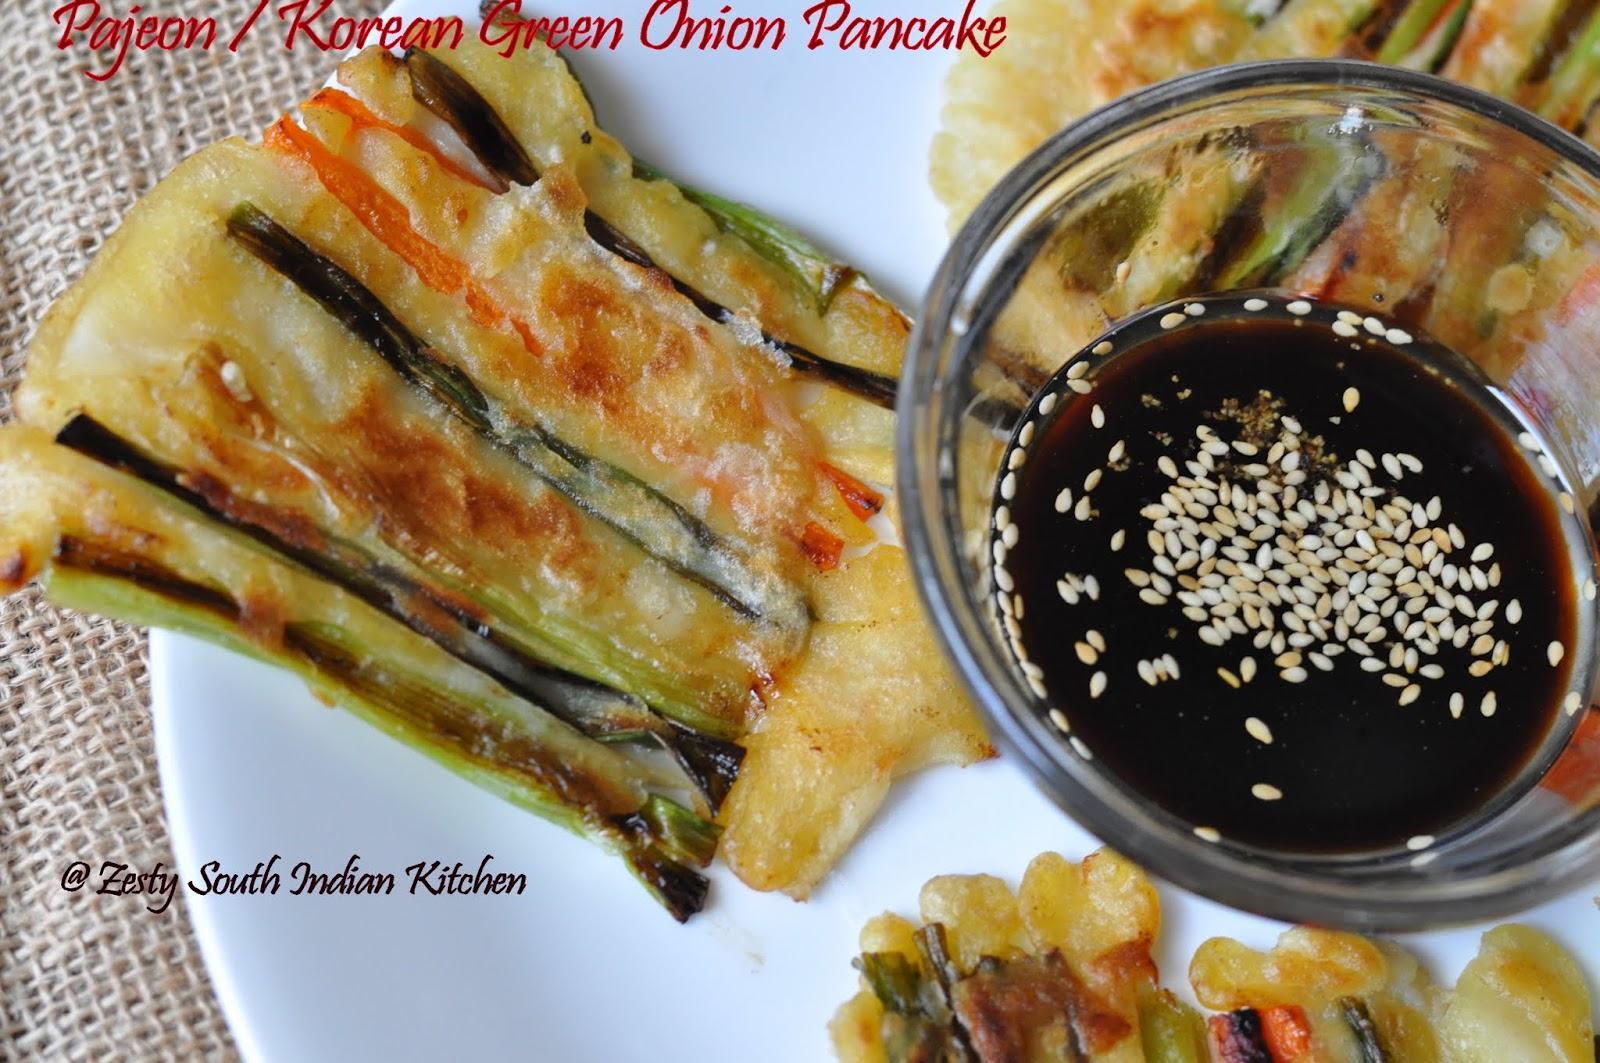 Pajeon/ Korean Green Onion Pancake - Zesty South Indian Kitchen